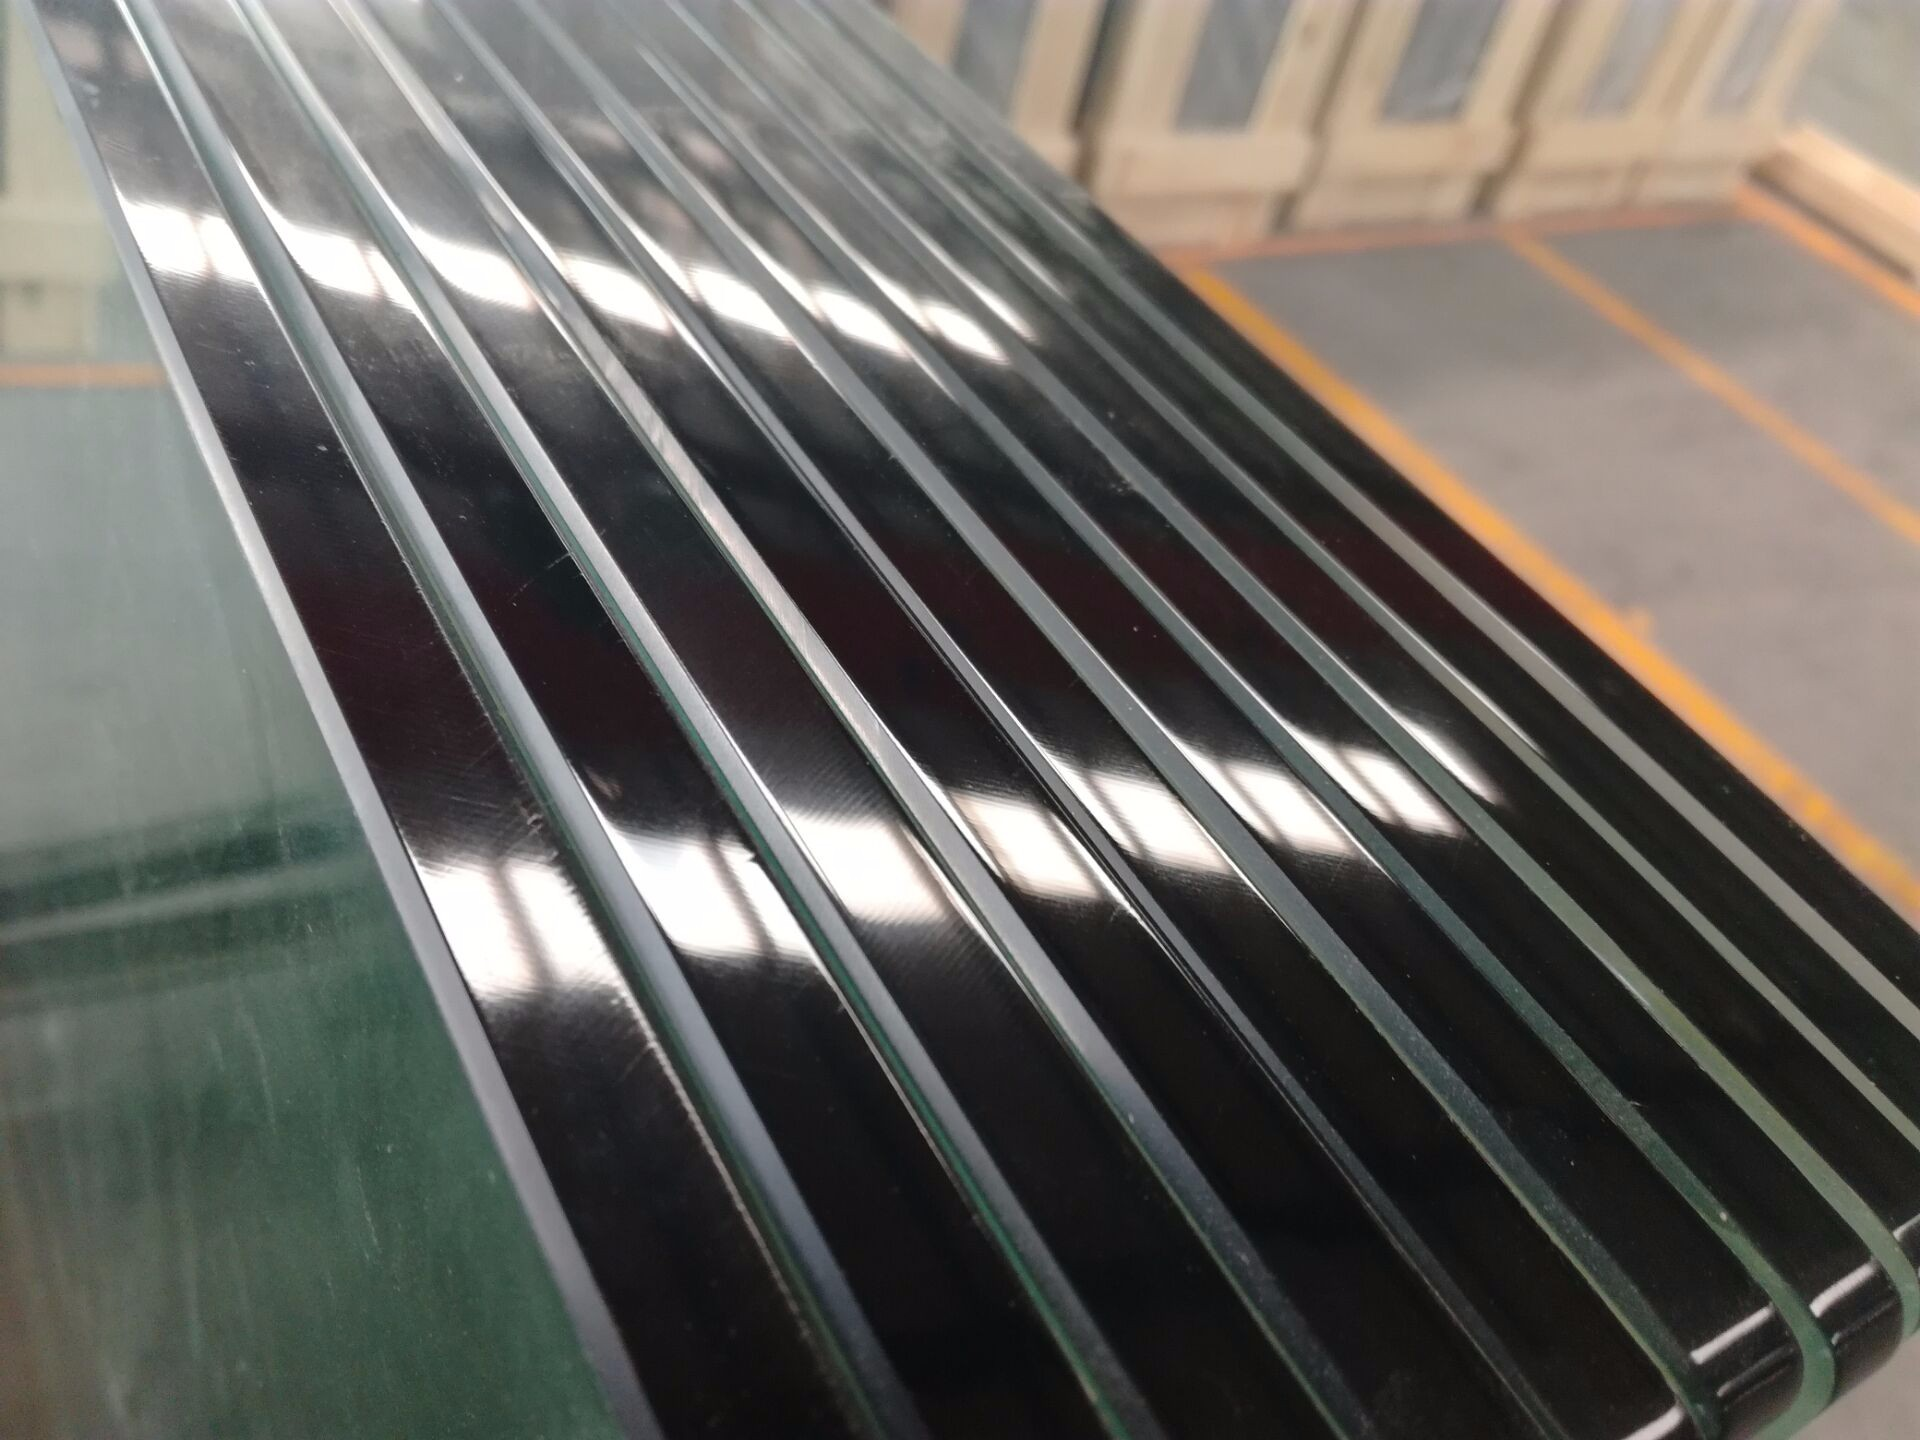 Round Edge Tempered Glass Manufacturers, Round Edge Tempered Glass Factory, Round Edge Tempered Glass